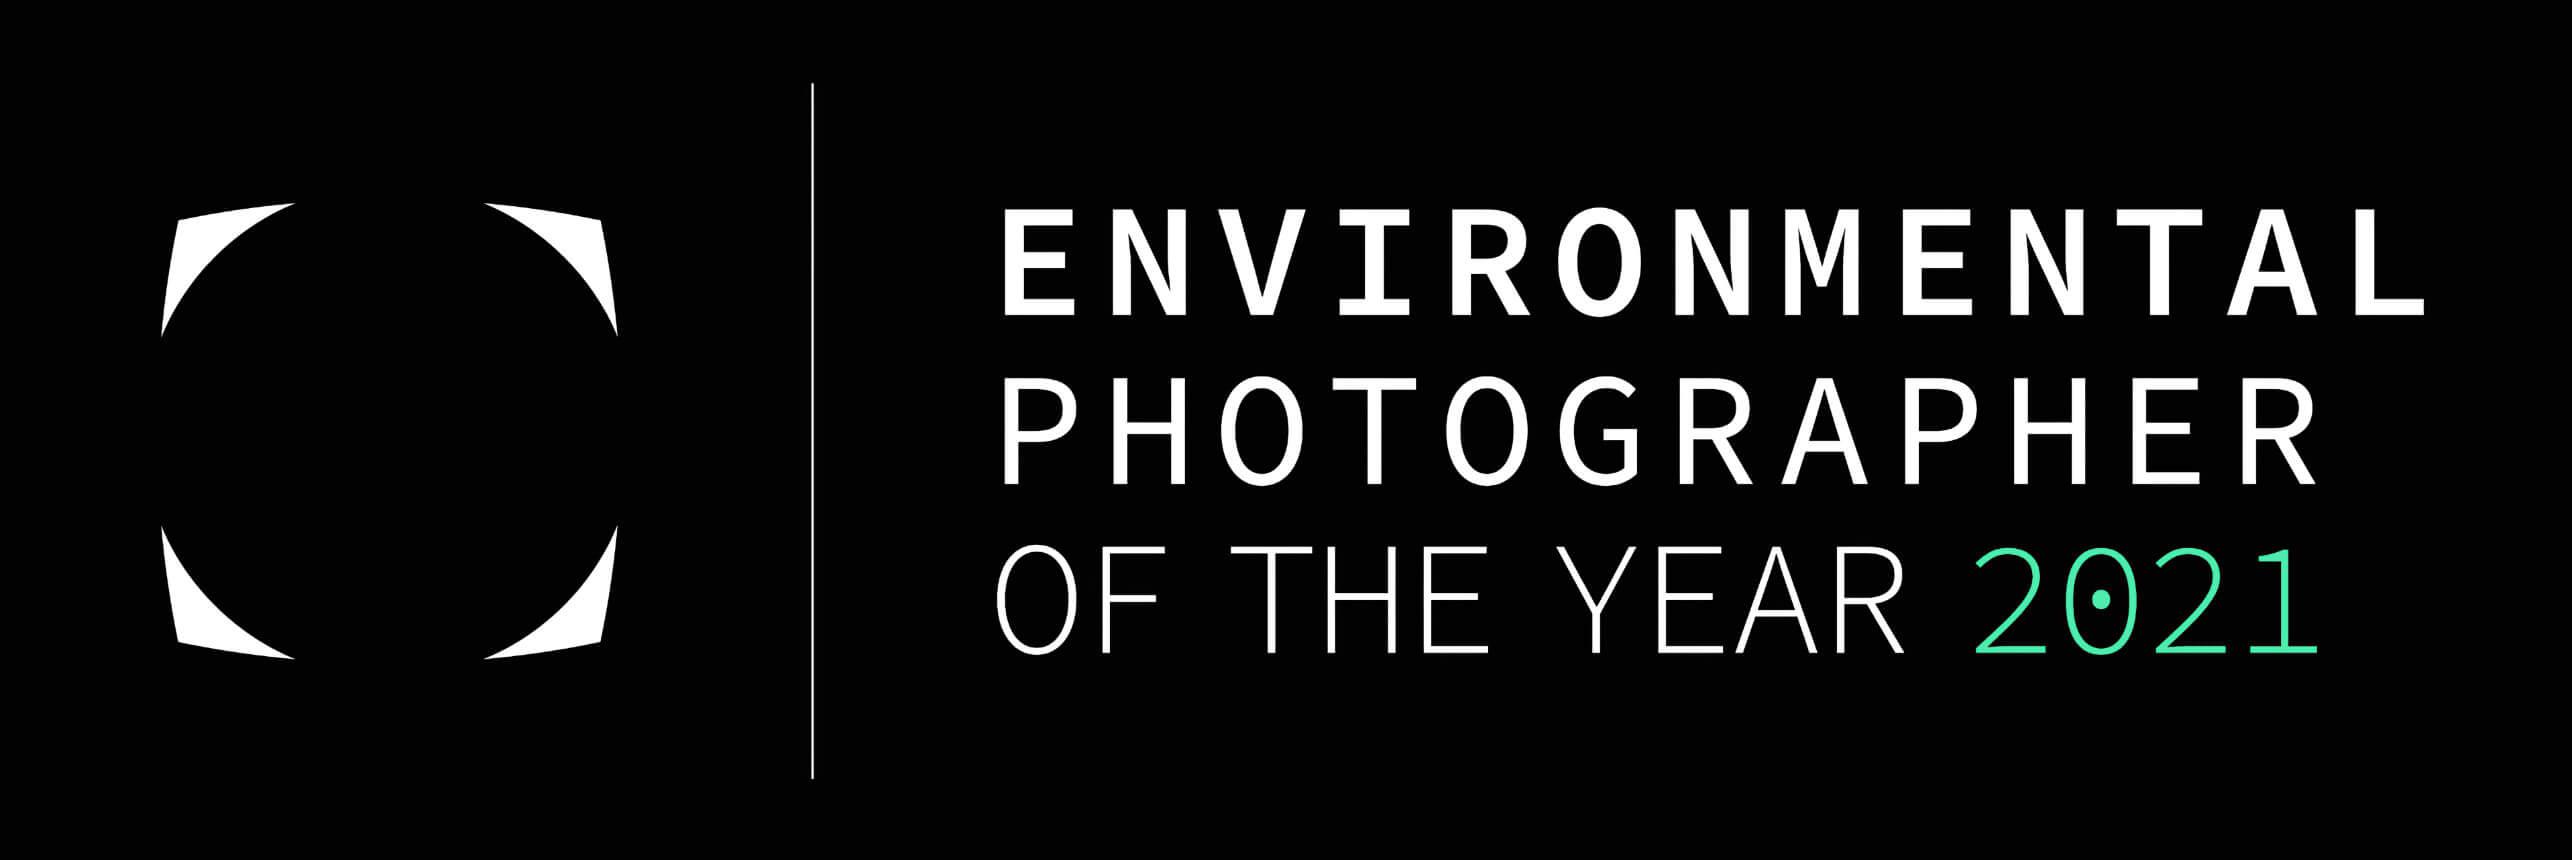 Soutěž Environmental Photographer Of The Year také s Nikonem